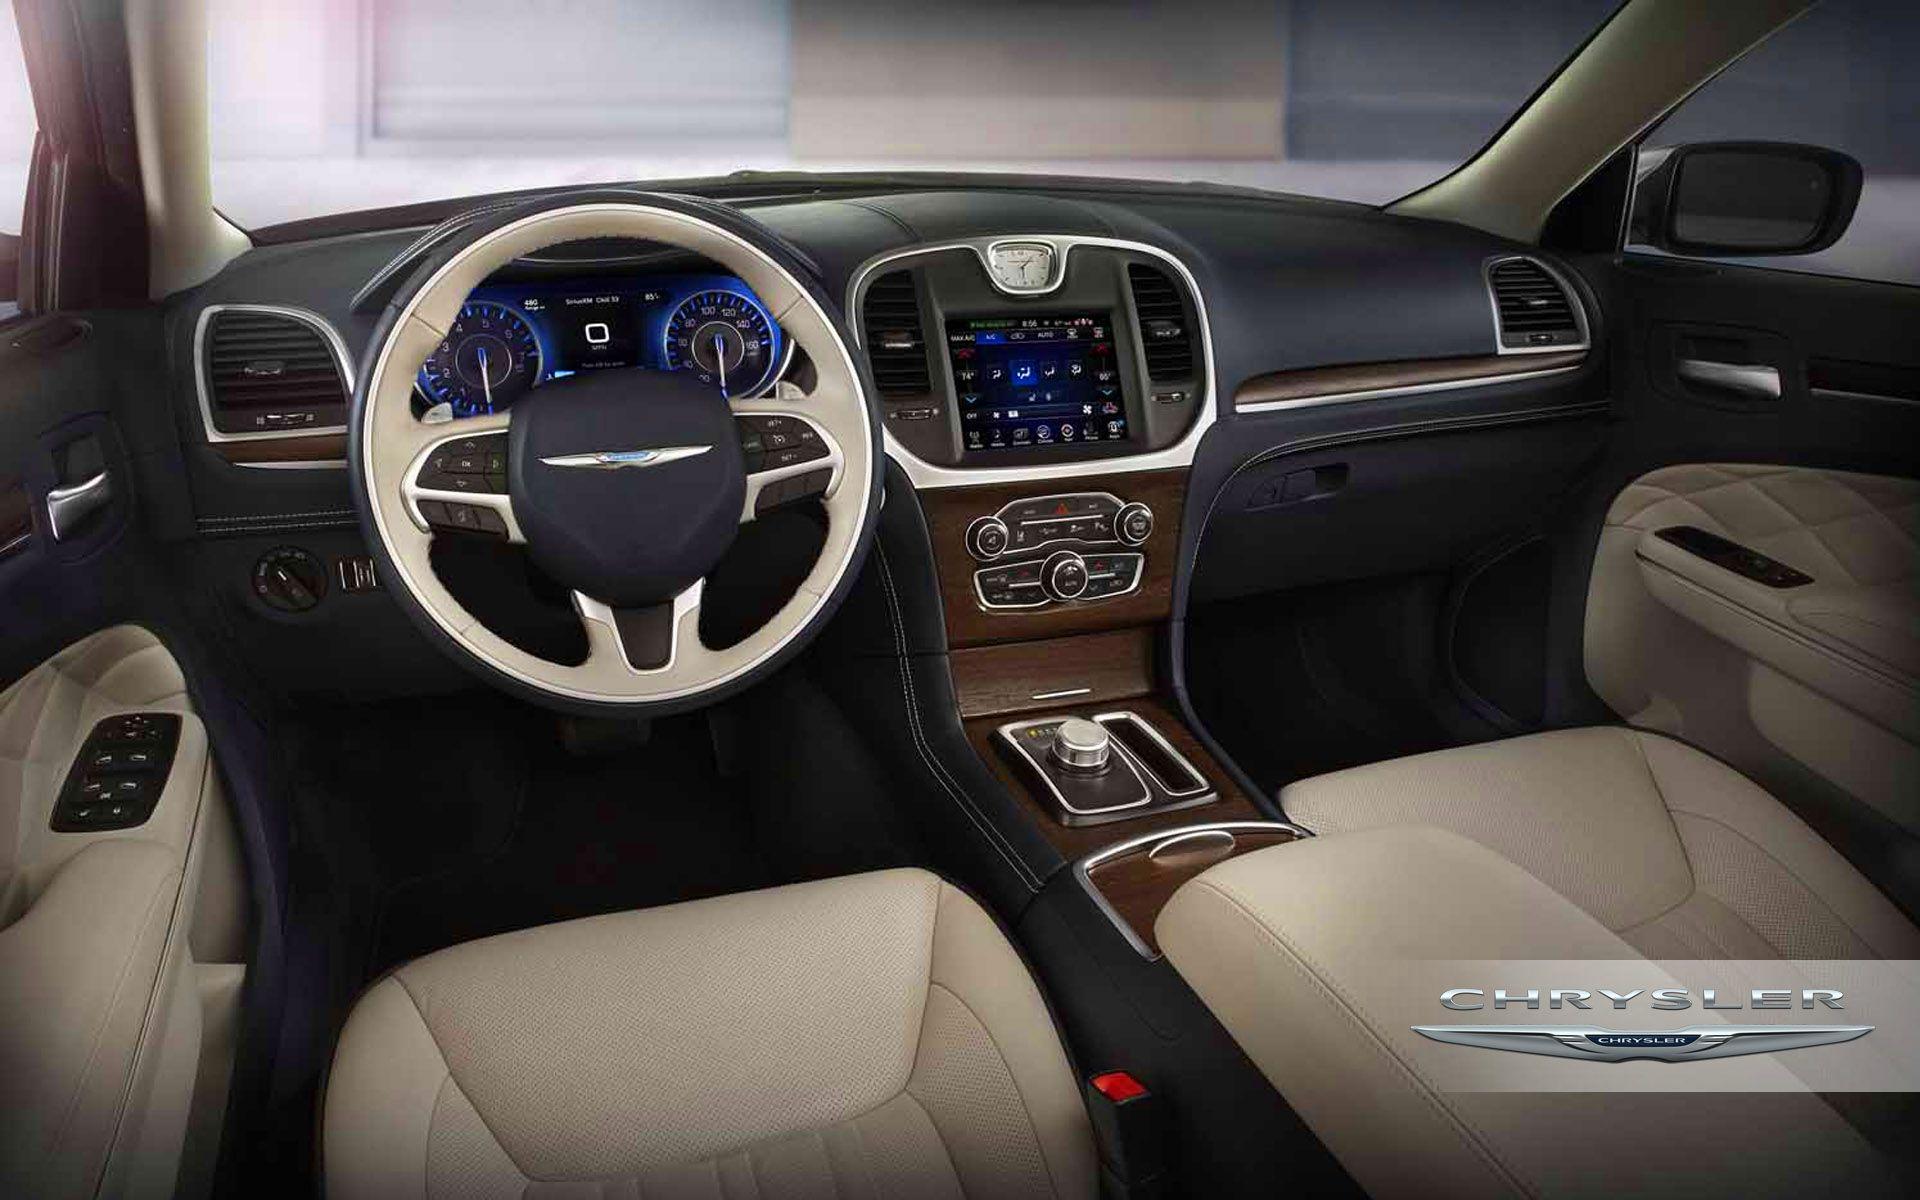 2017 Chrysler 300 Interior Dashboard Image Wallpaper